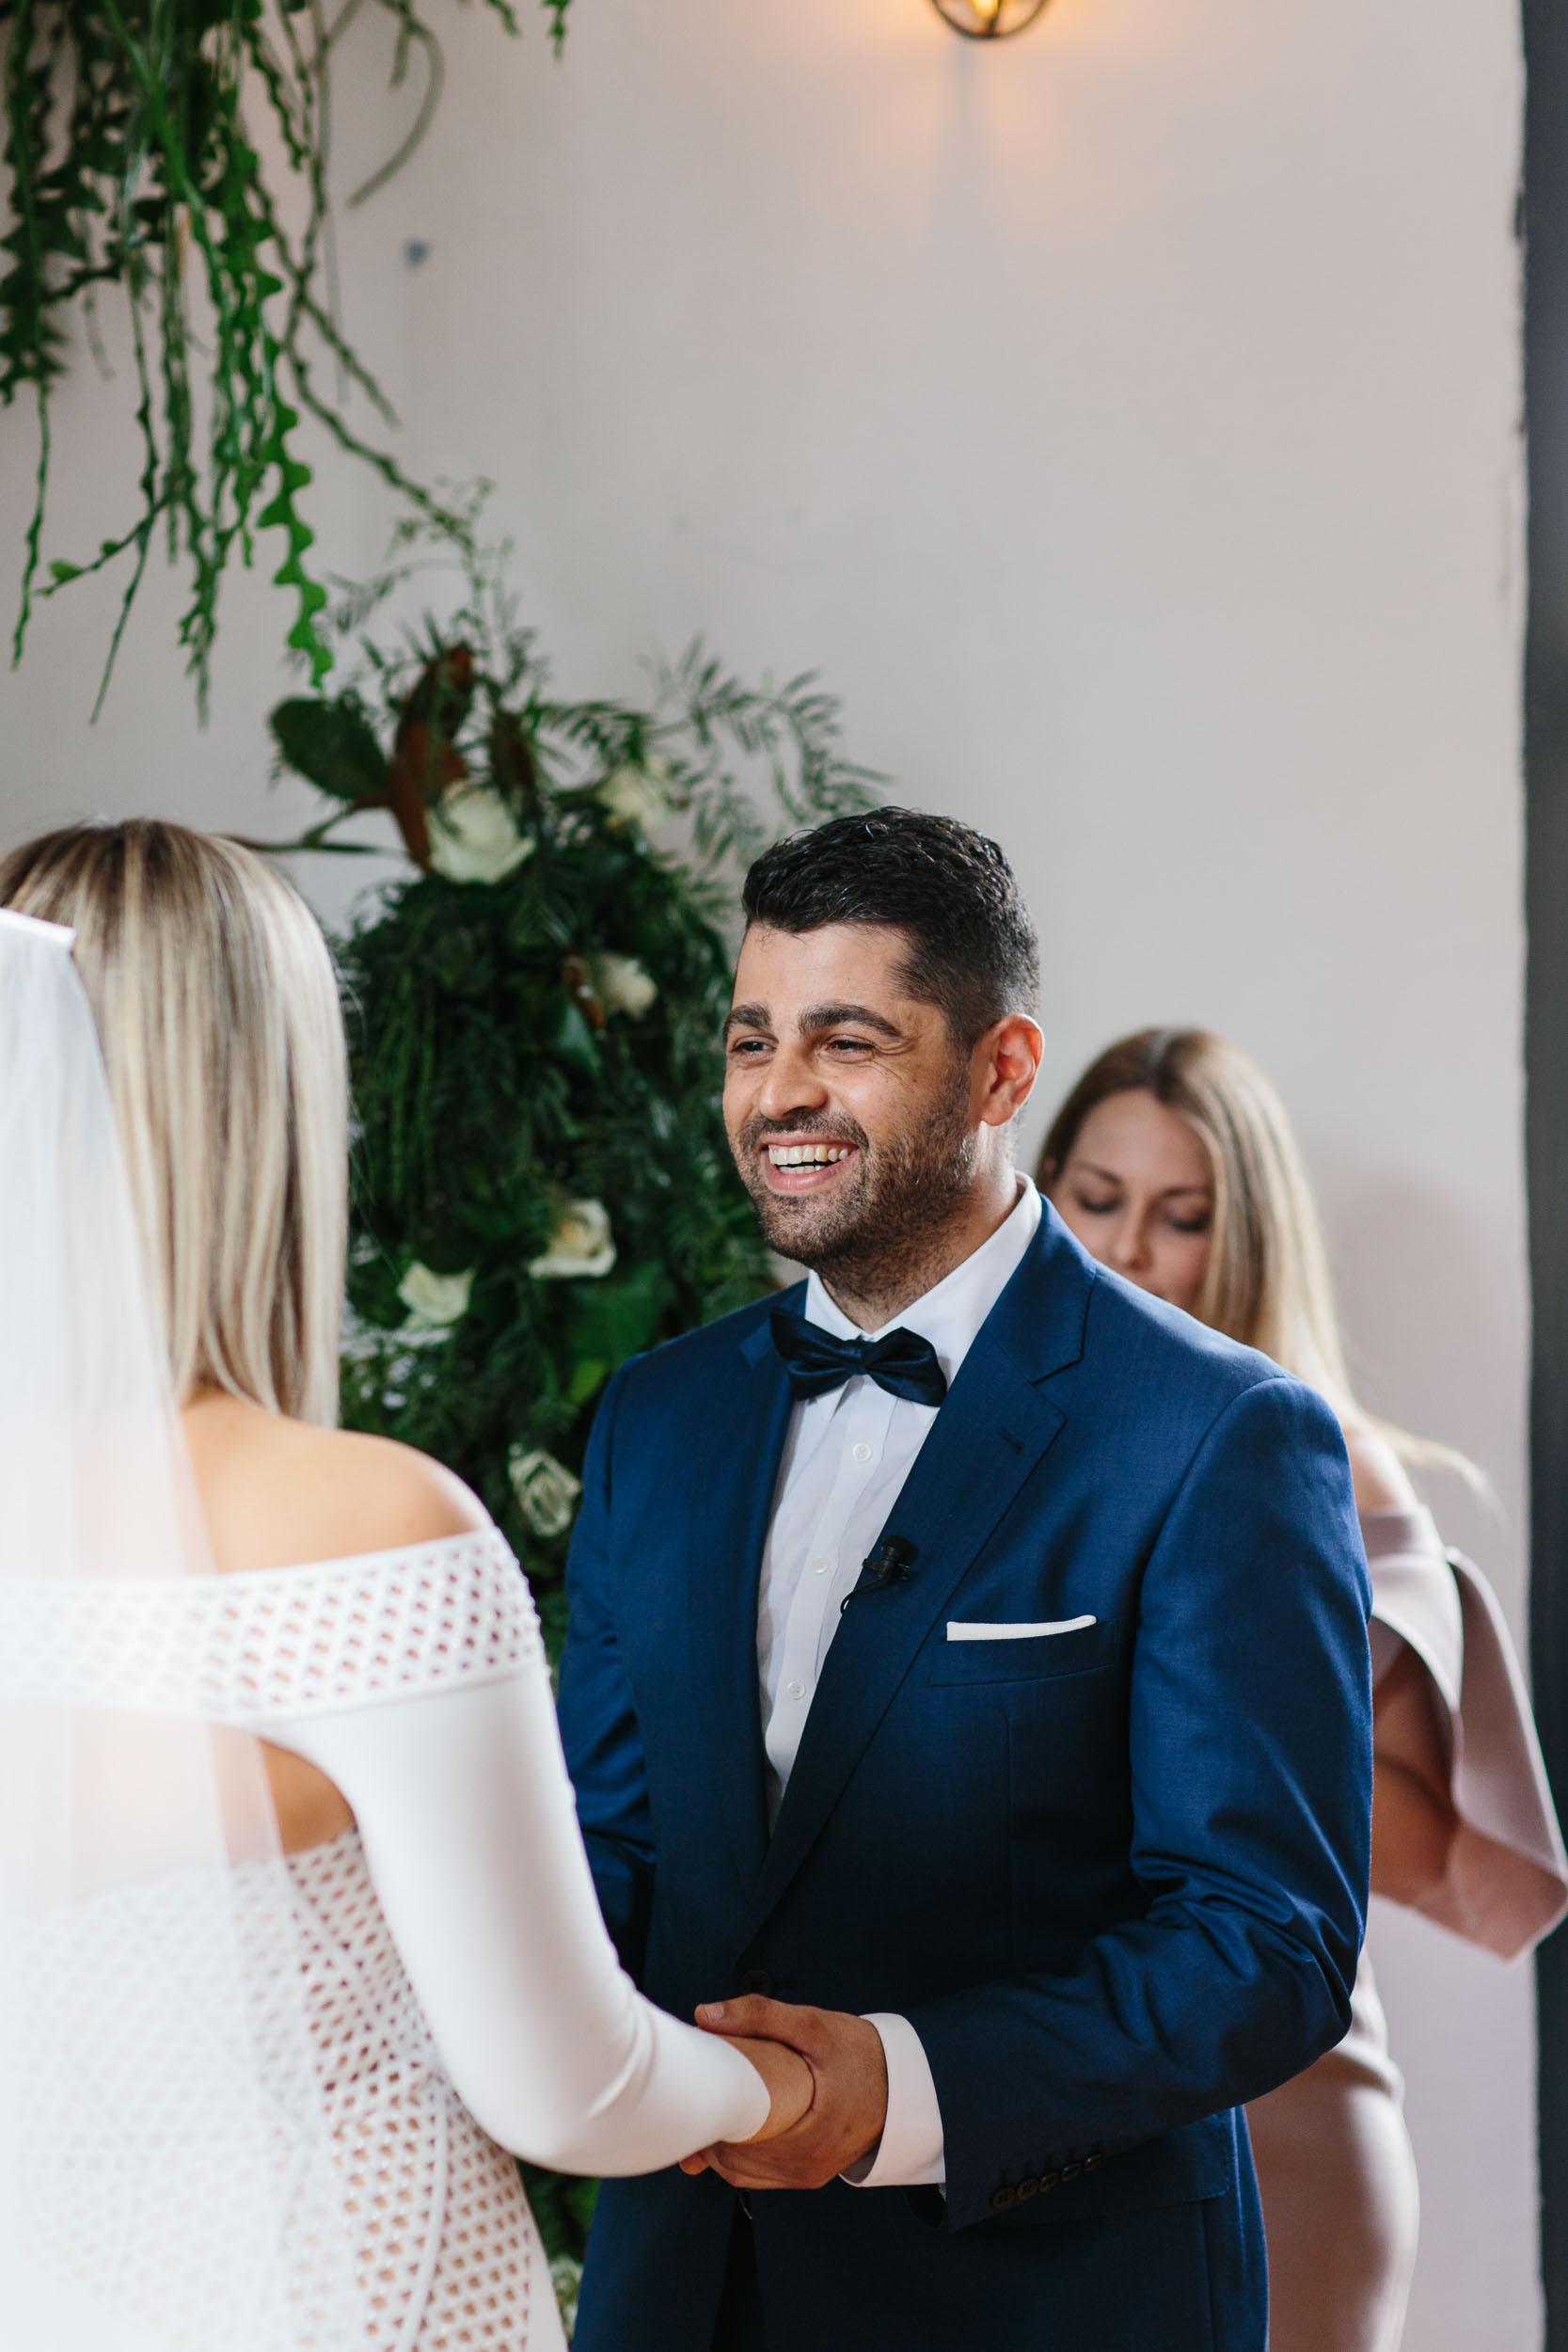 Kas-Richards-Urban-Melbourne-Wedding-Jason-Grech-306.jpg